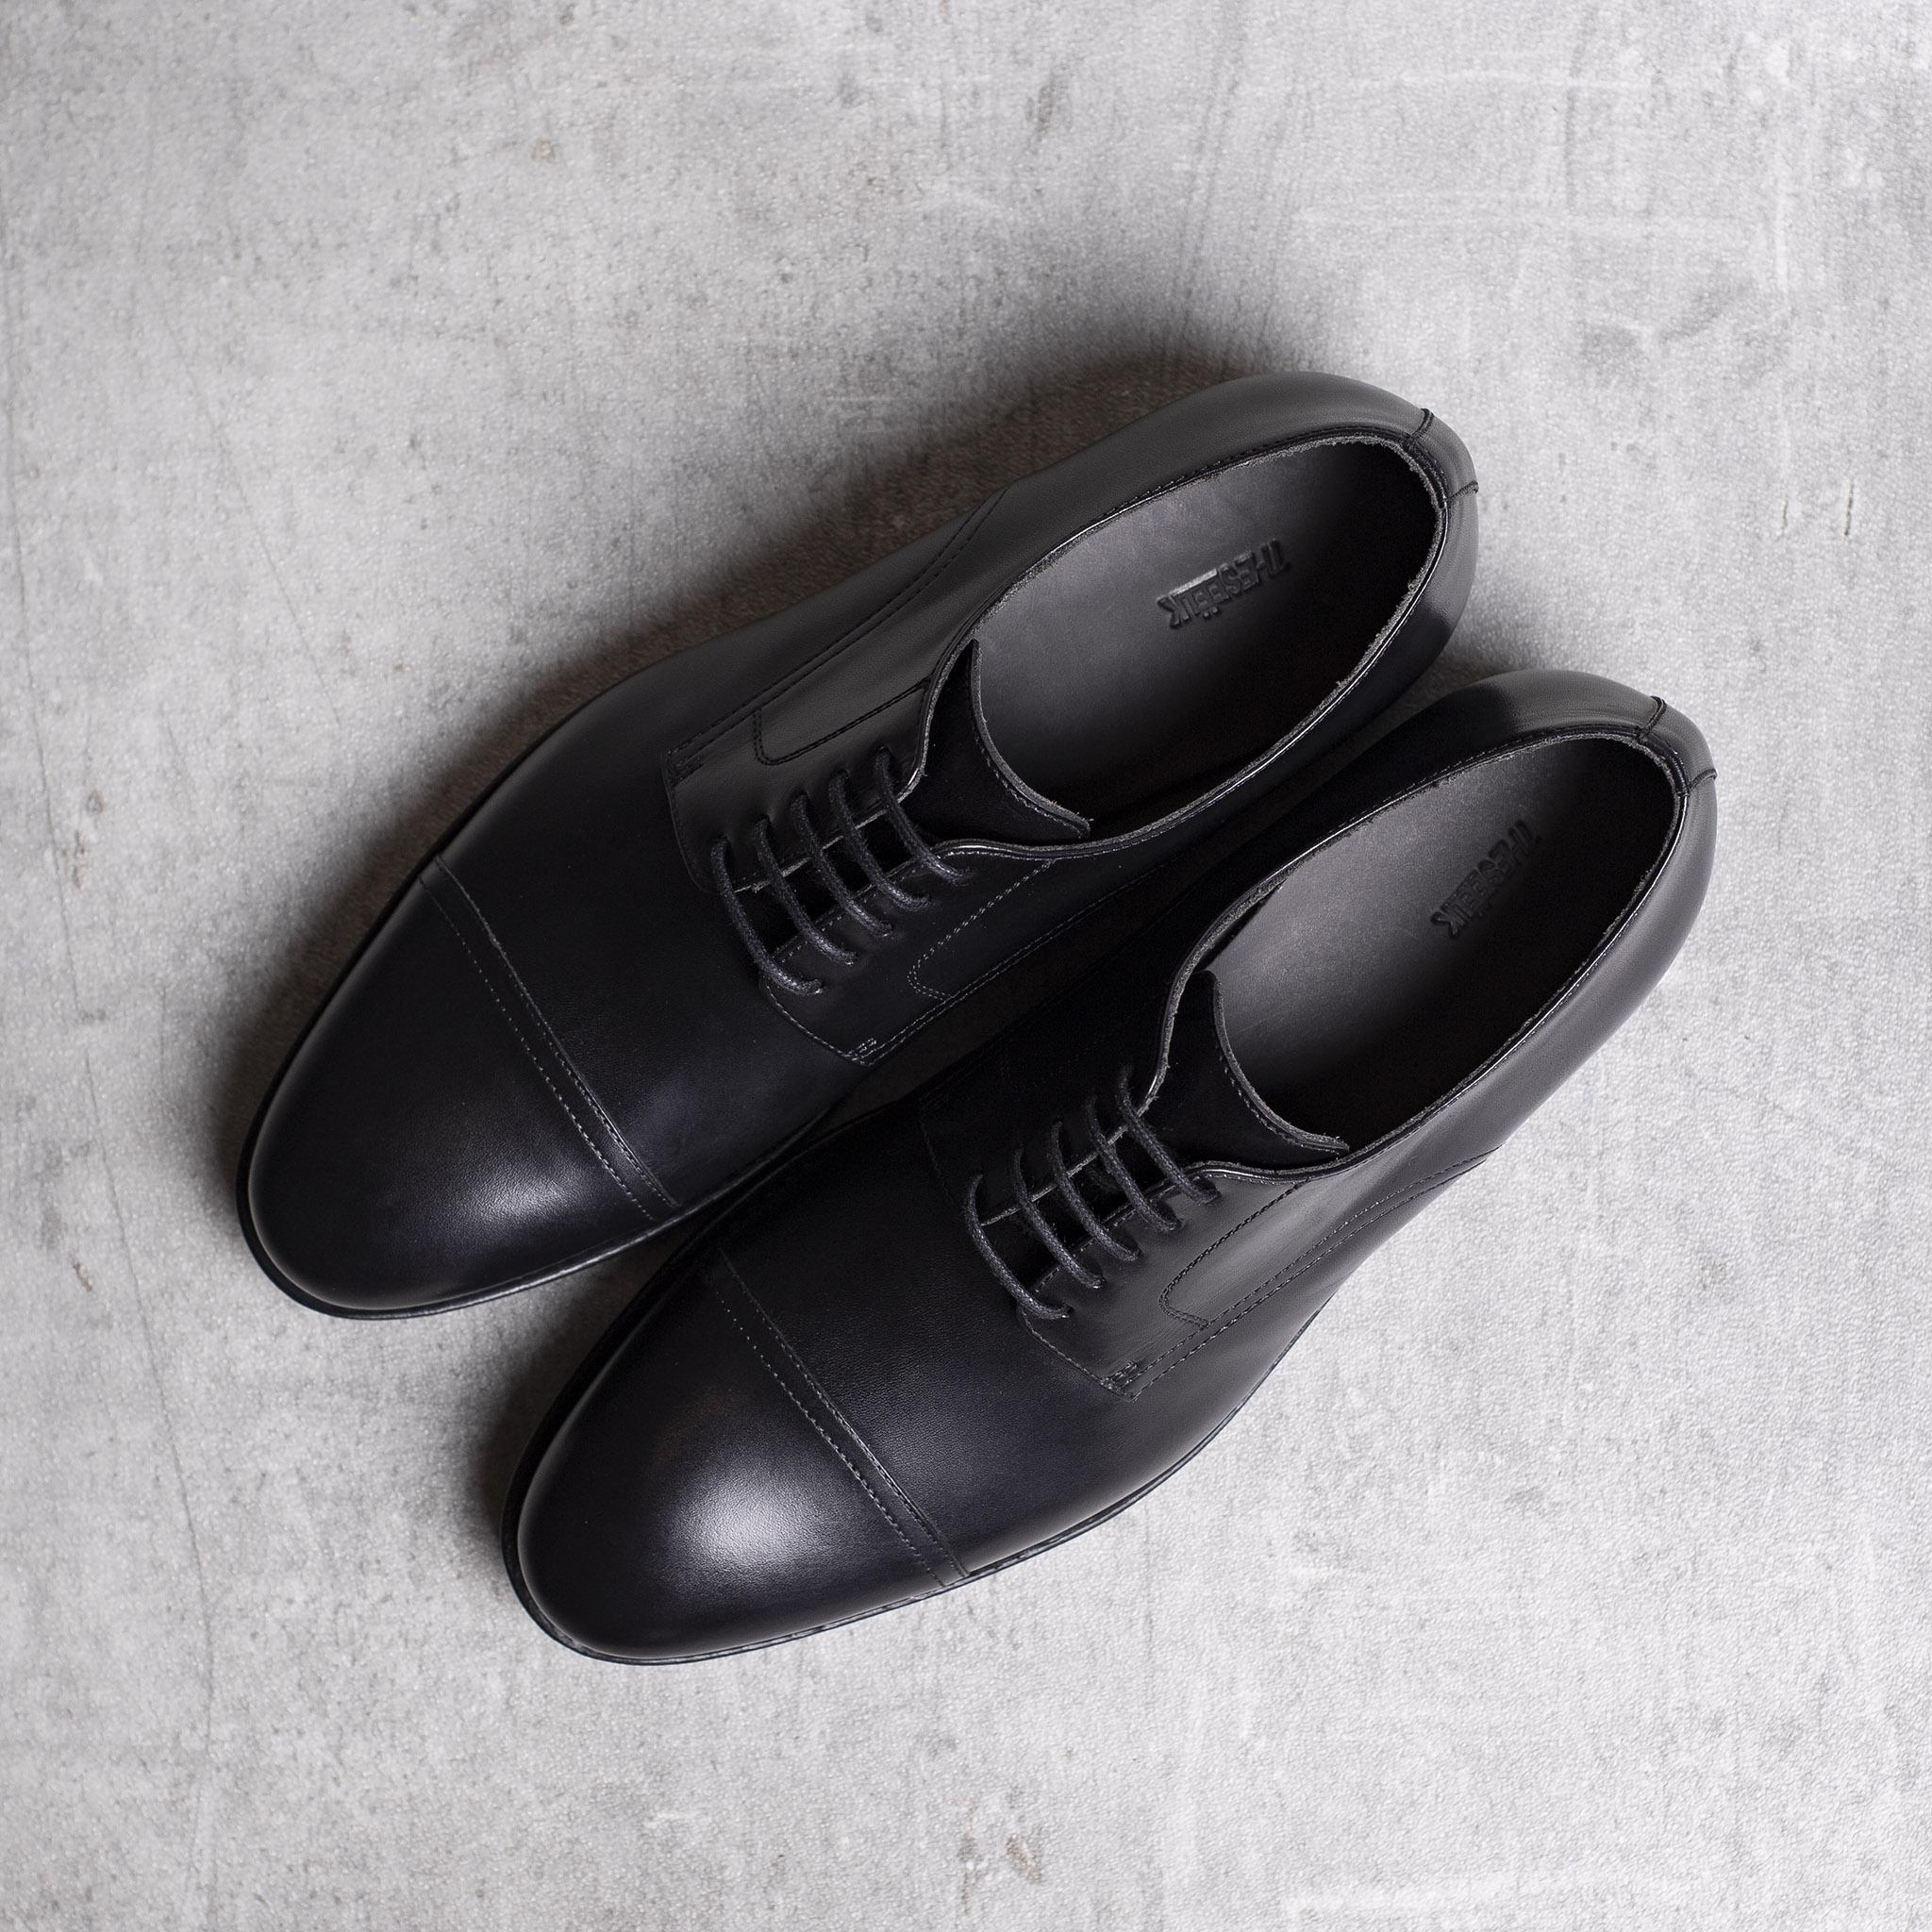 DERBY · 0649 Black leather The Seëlk 1